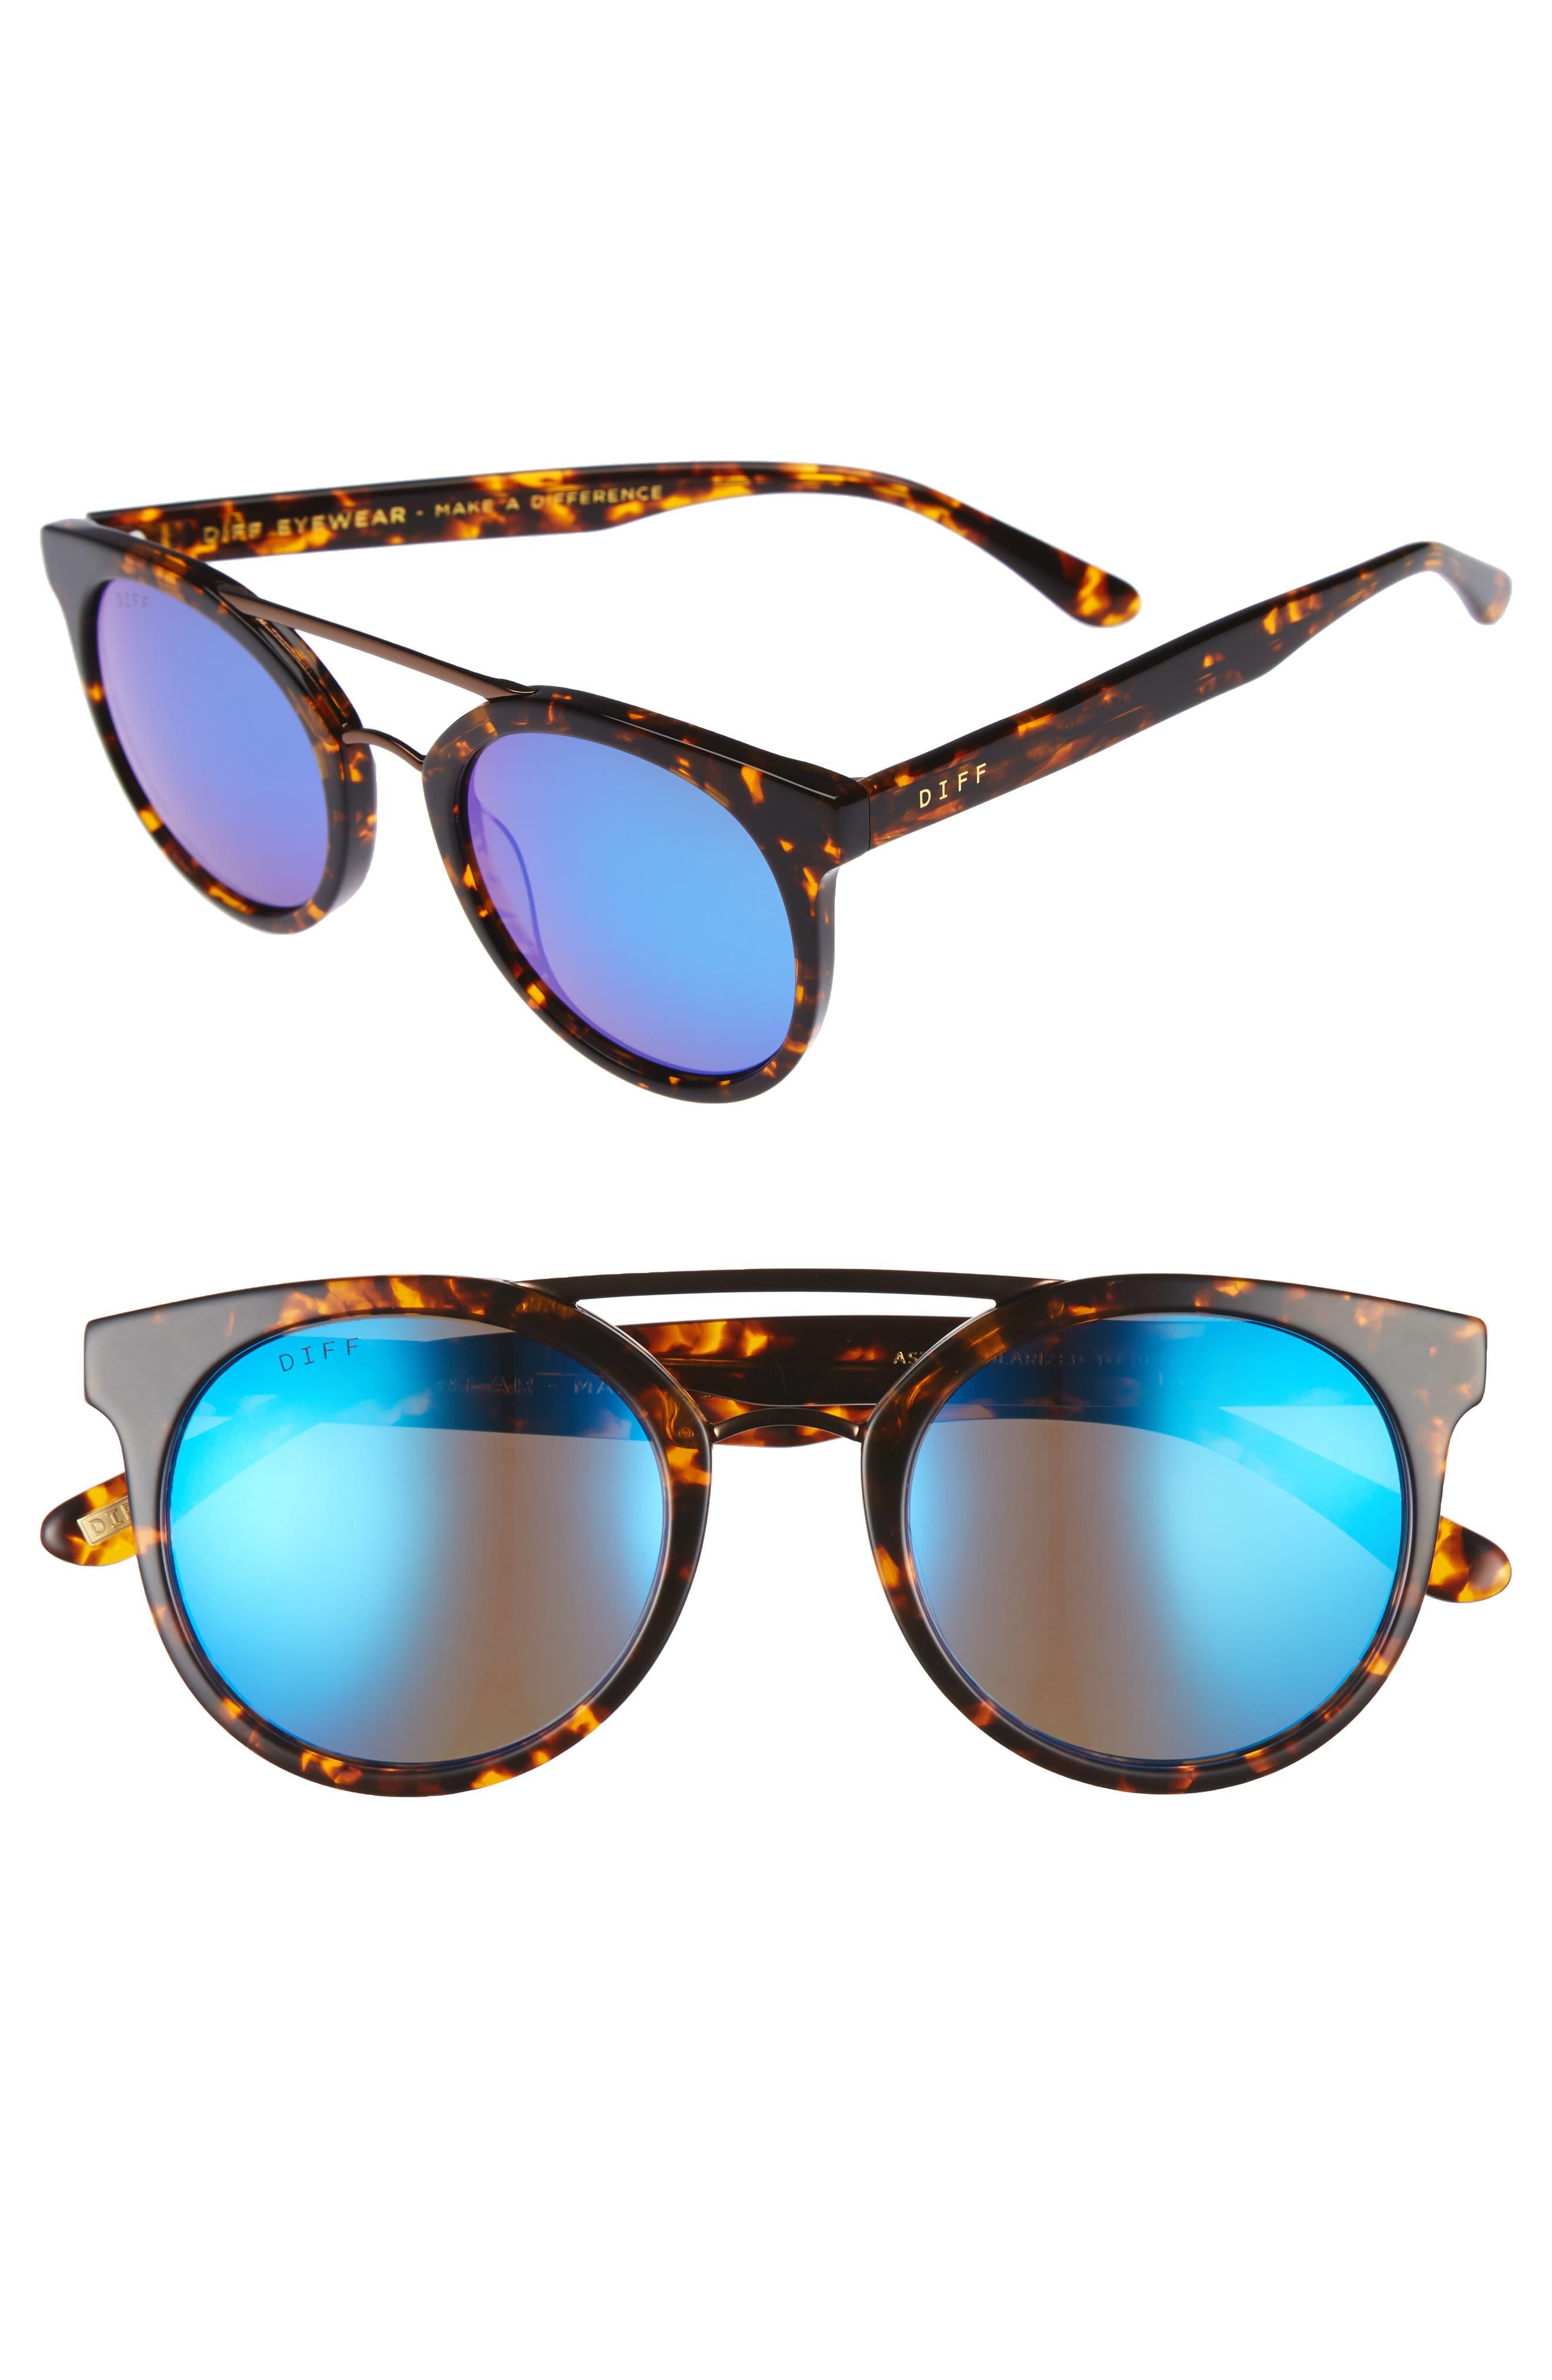 Alternate Image 1 Selected - DIFF Astro 49mm Polarized Aviator Sunglasses